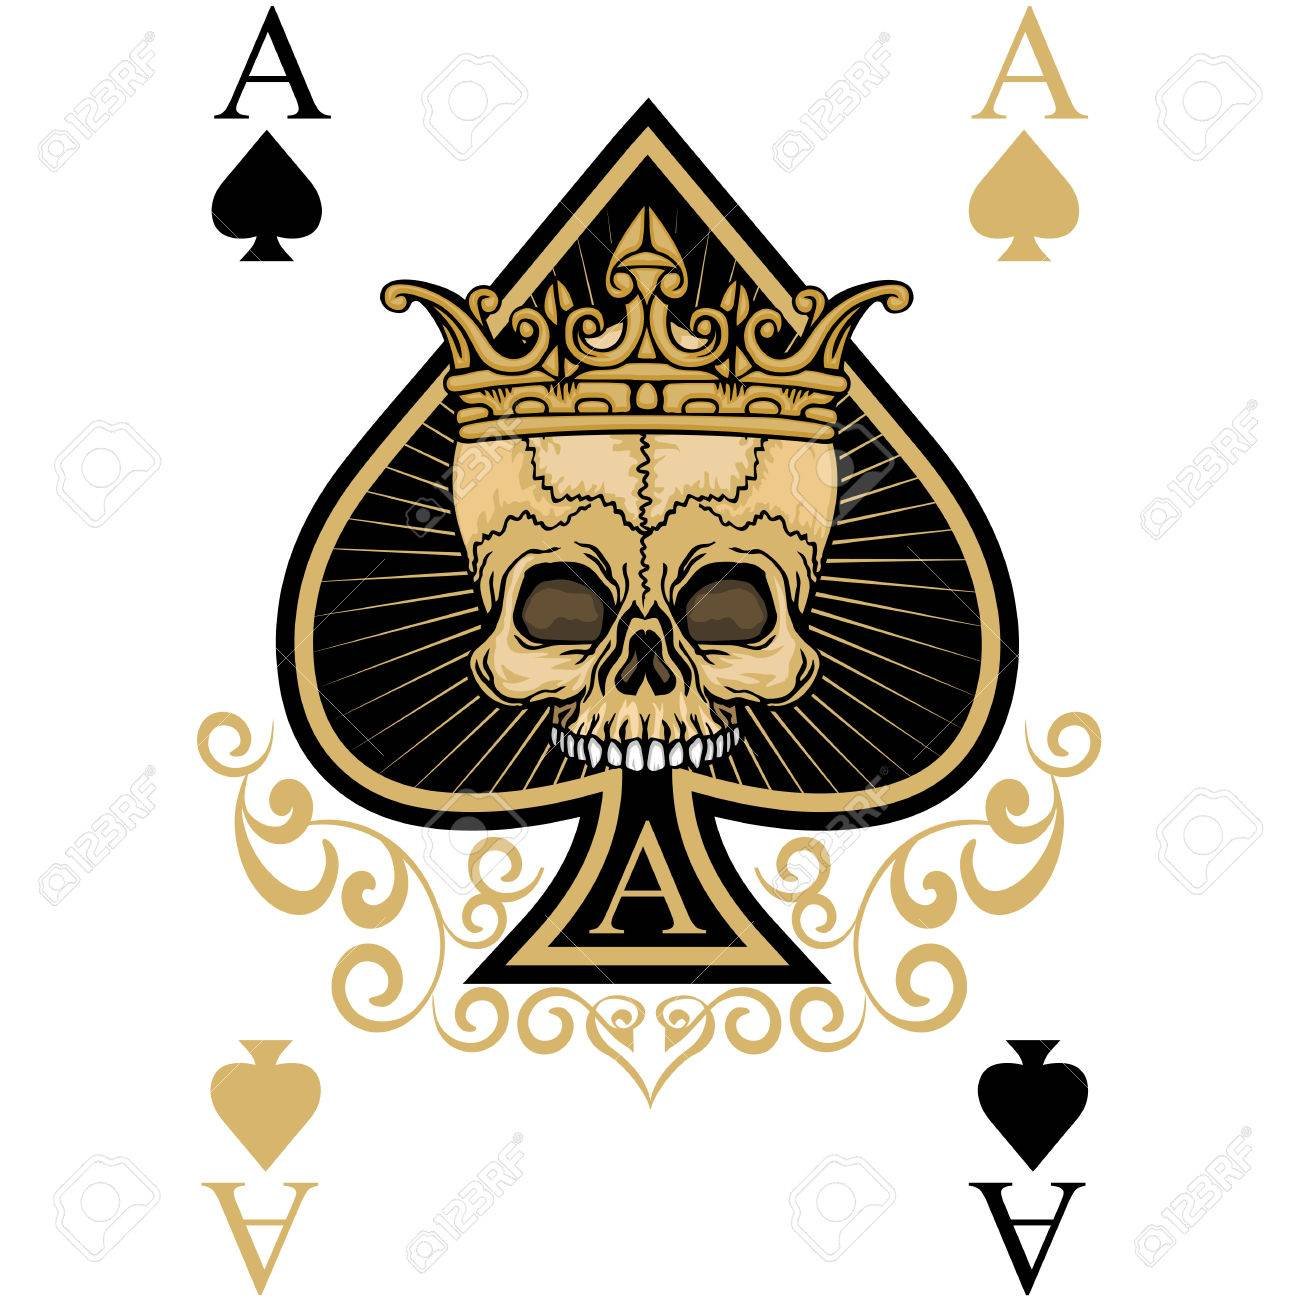 grunge skull coat of arms - 76489021